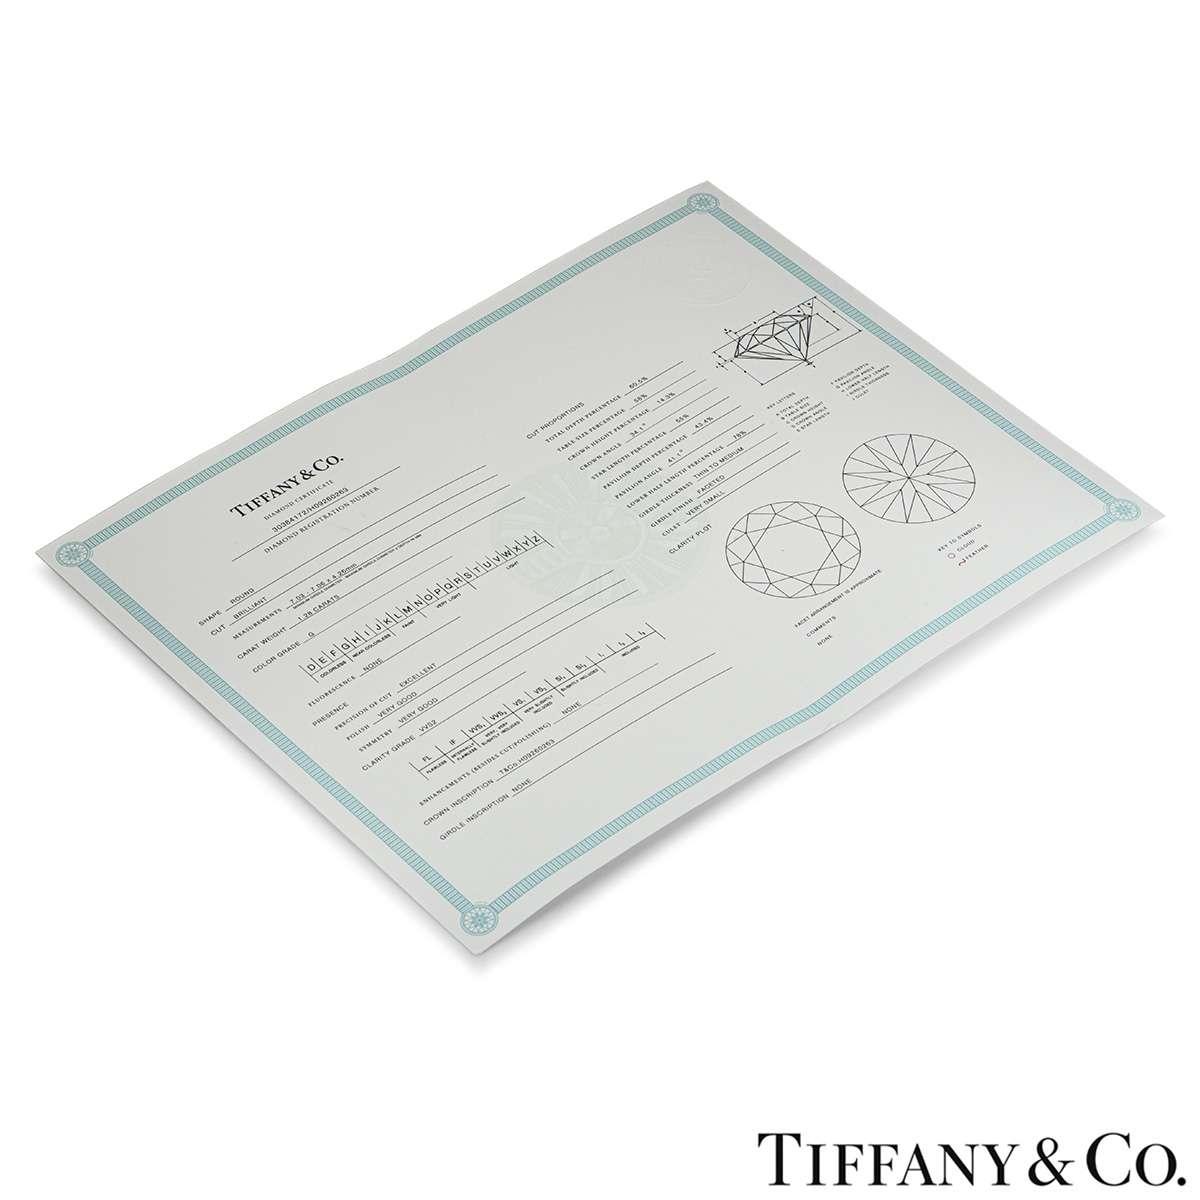 Tiffany & Co. Platinum Diamond Ring 1.28ct G/VVS2